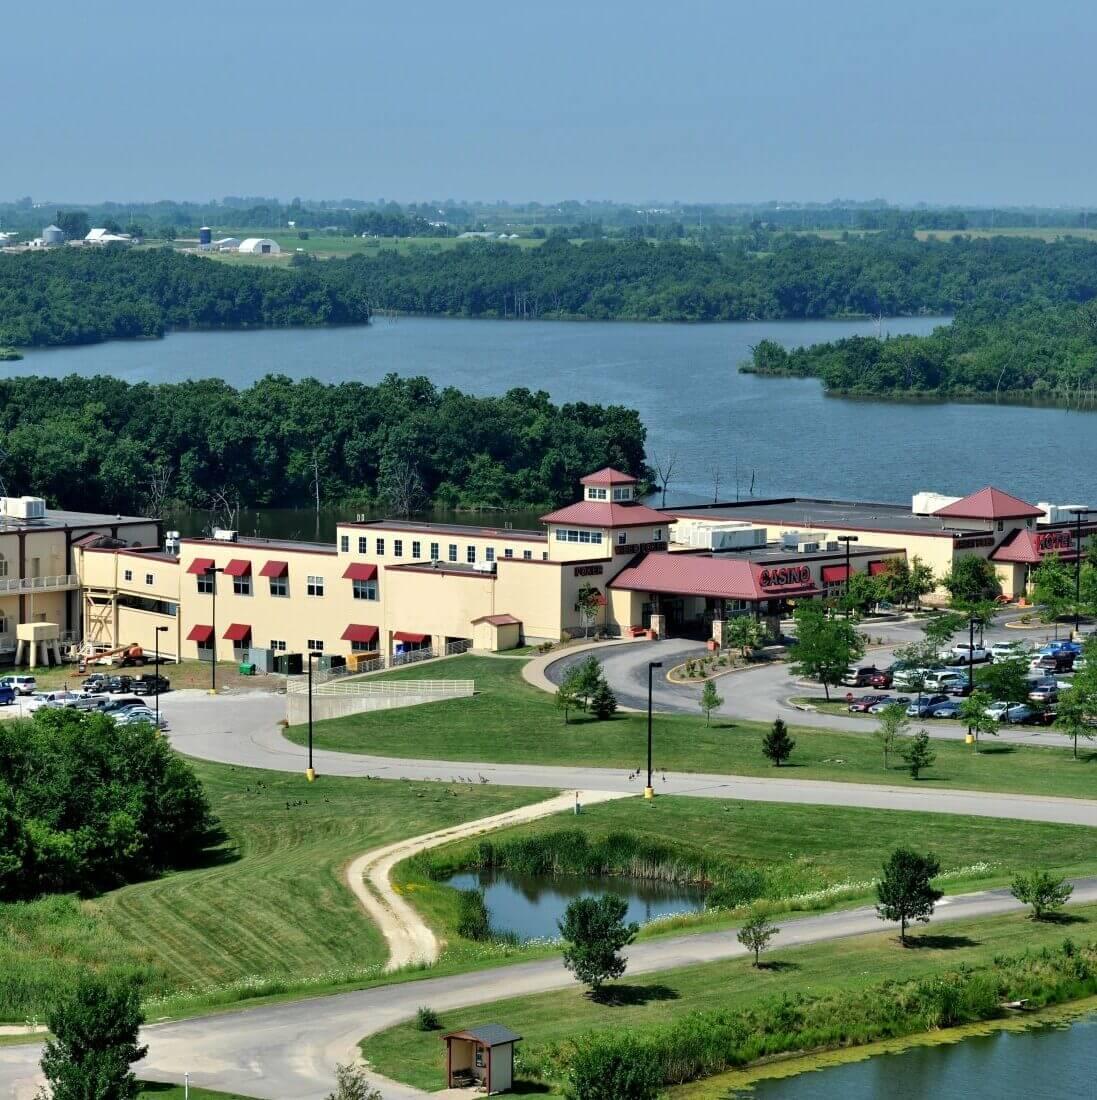 Lakeside Hotel & Casino